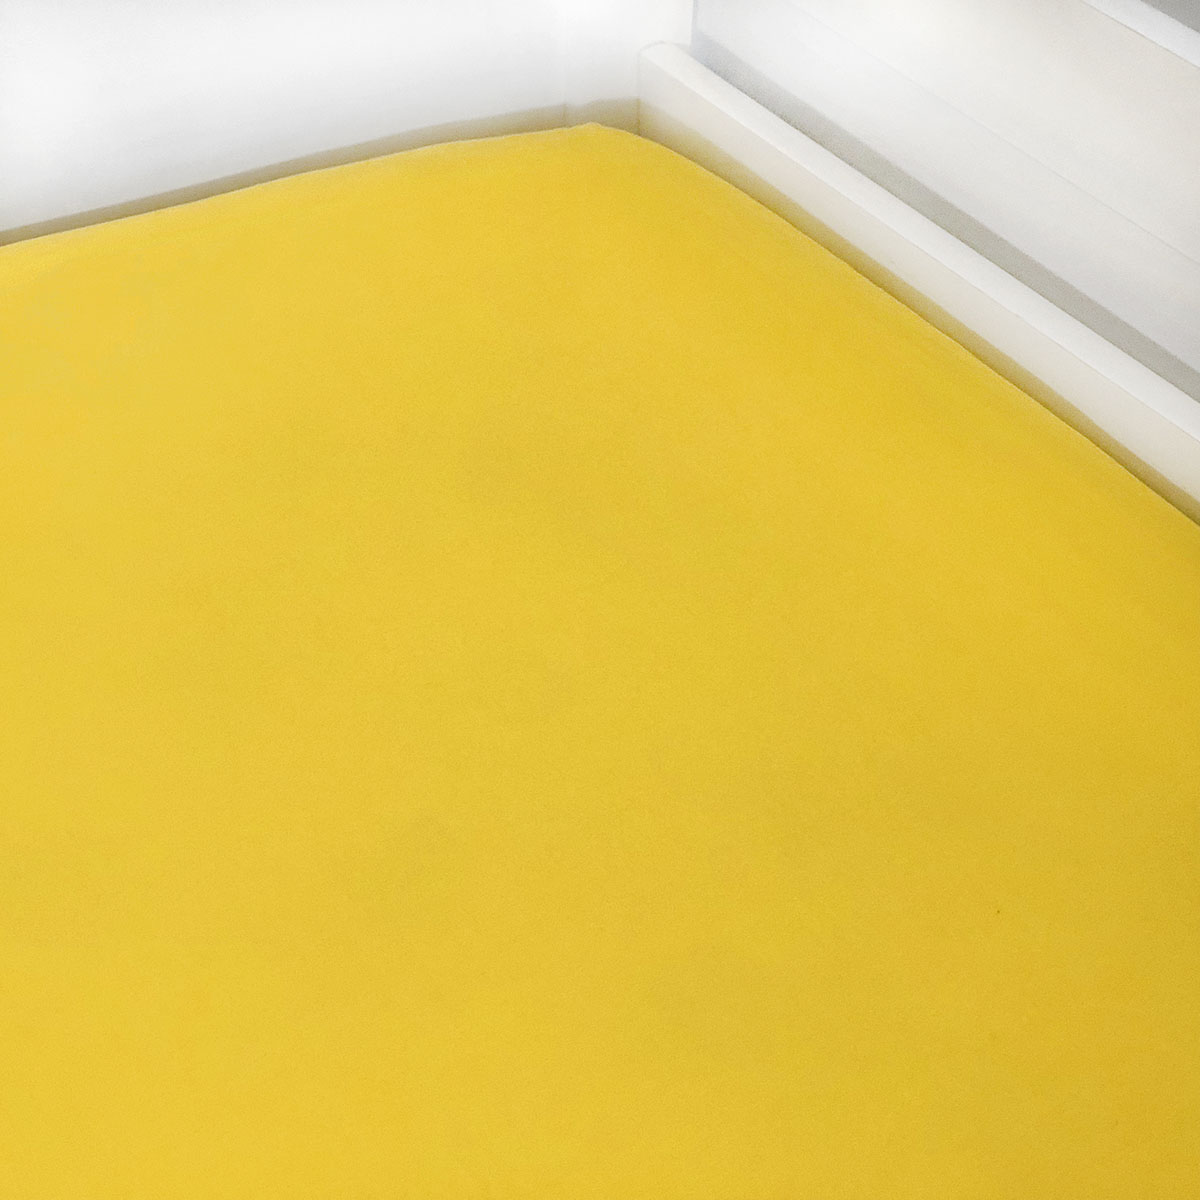 Lençol De Elástico Liso Amarelo